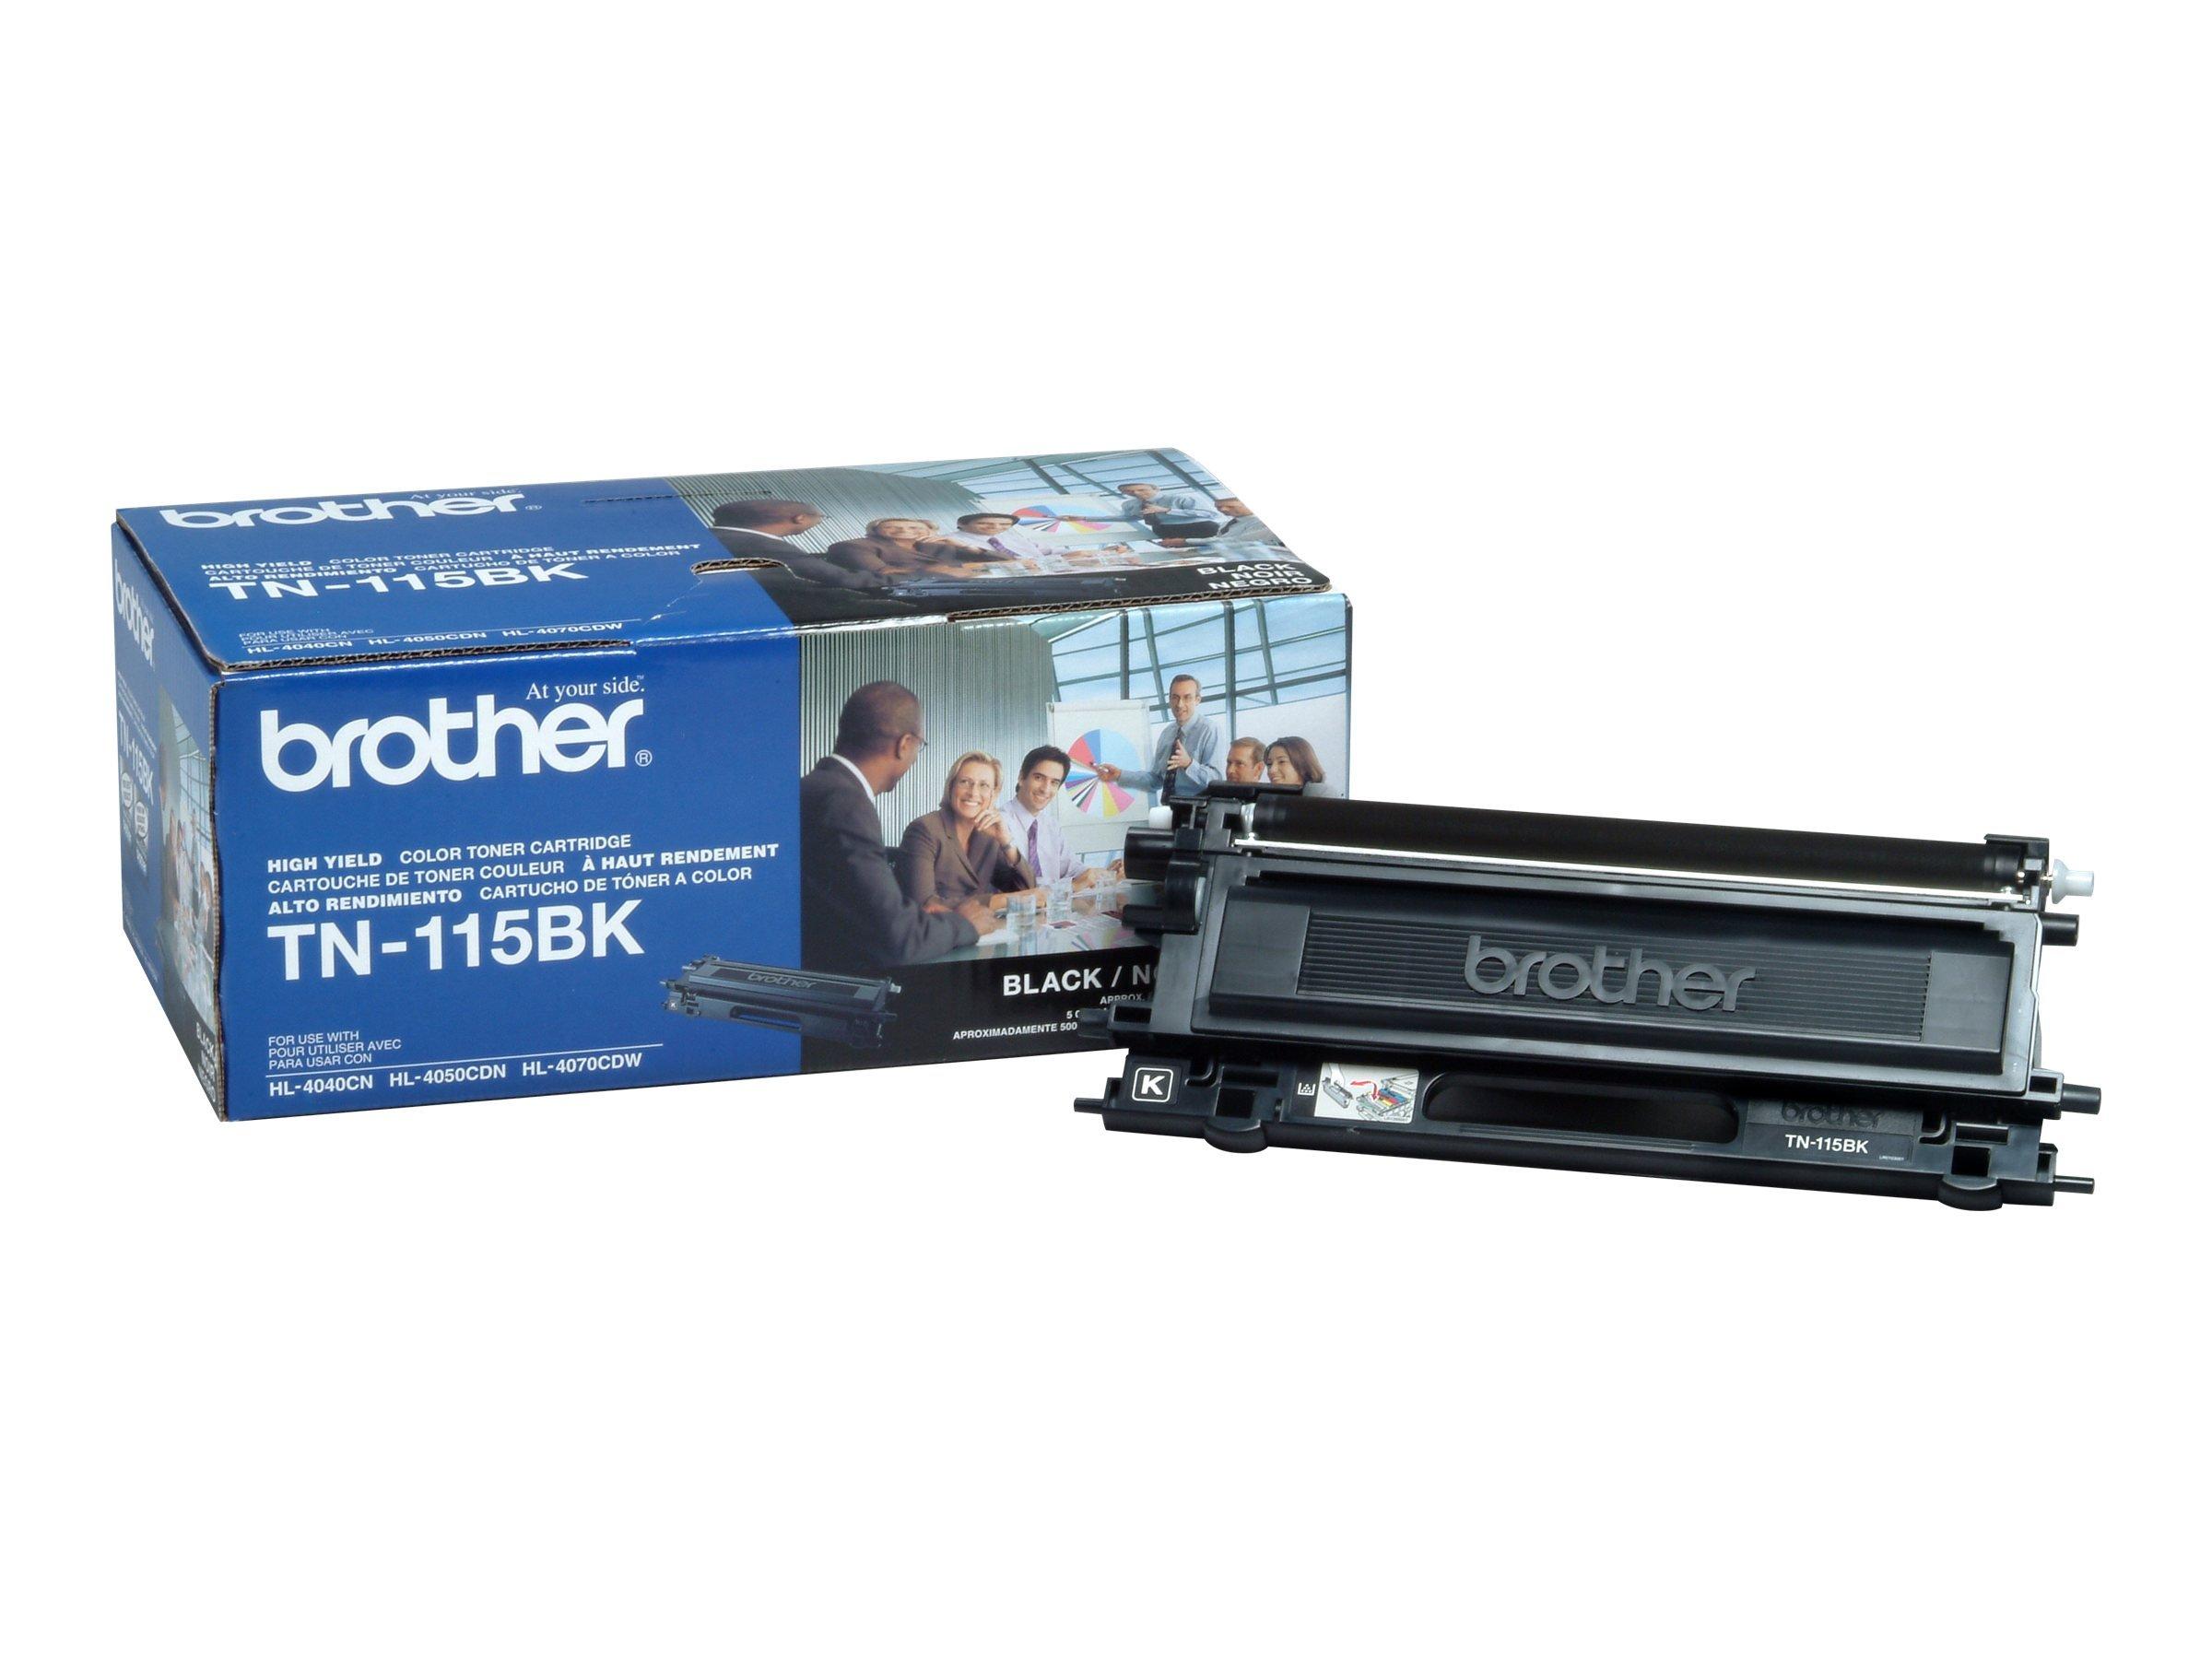 Brother TN-115BK High Yield Black Toner Cartridge for Brother HL4040CN,HL4070CDW Series